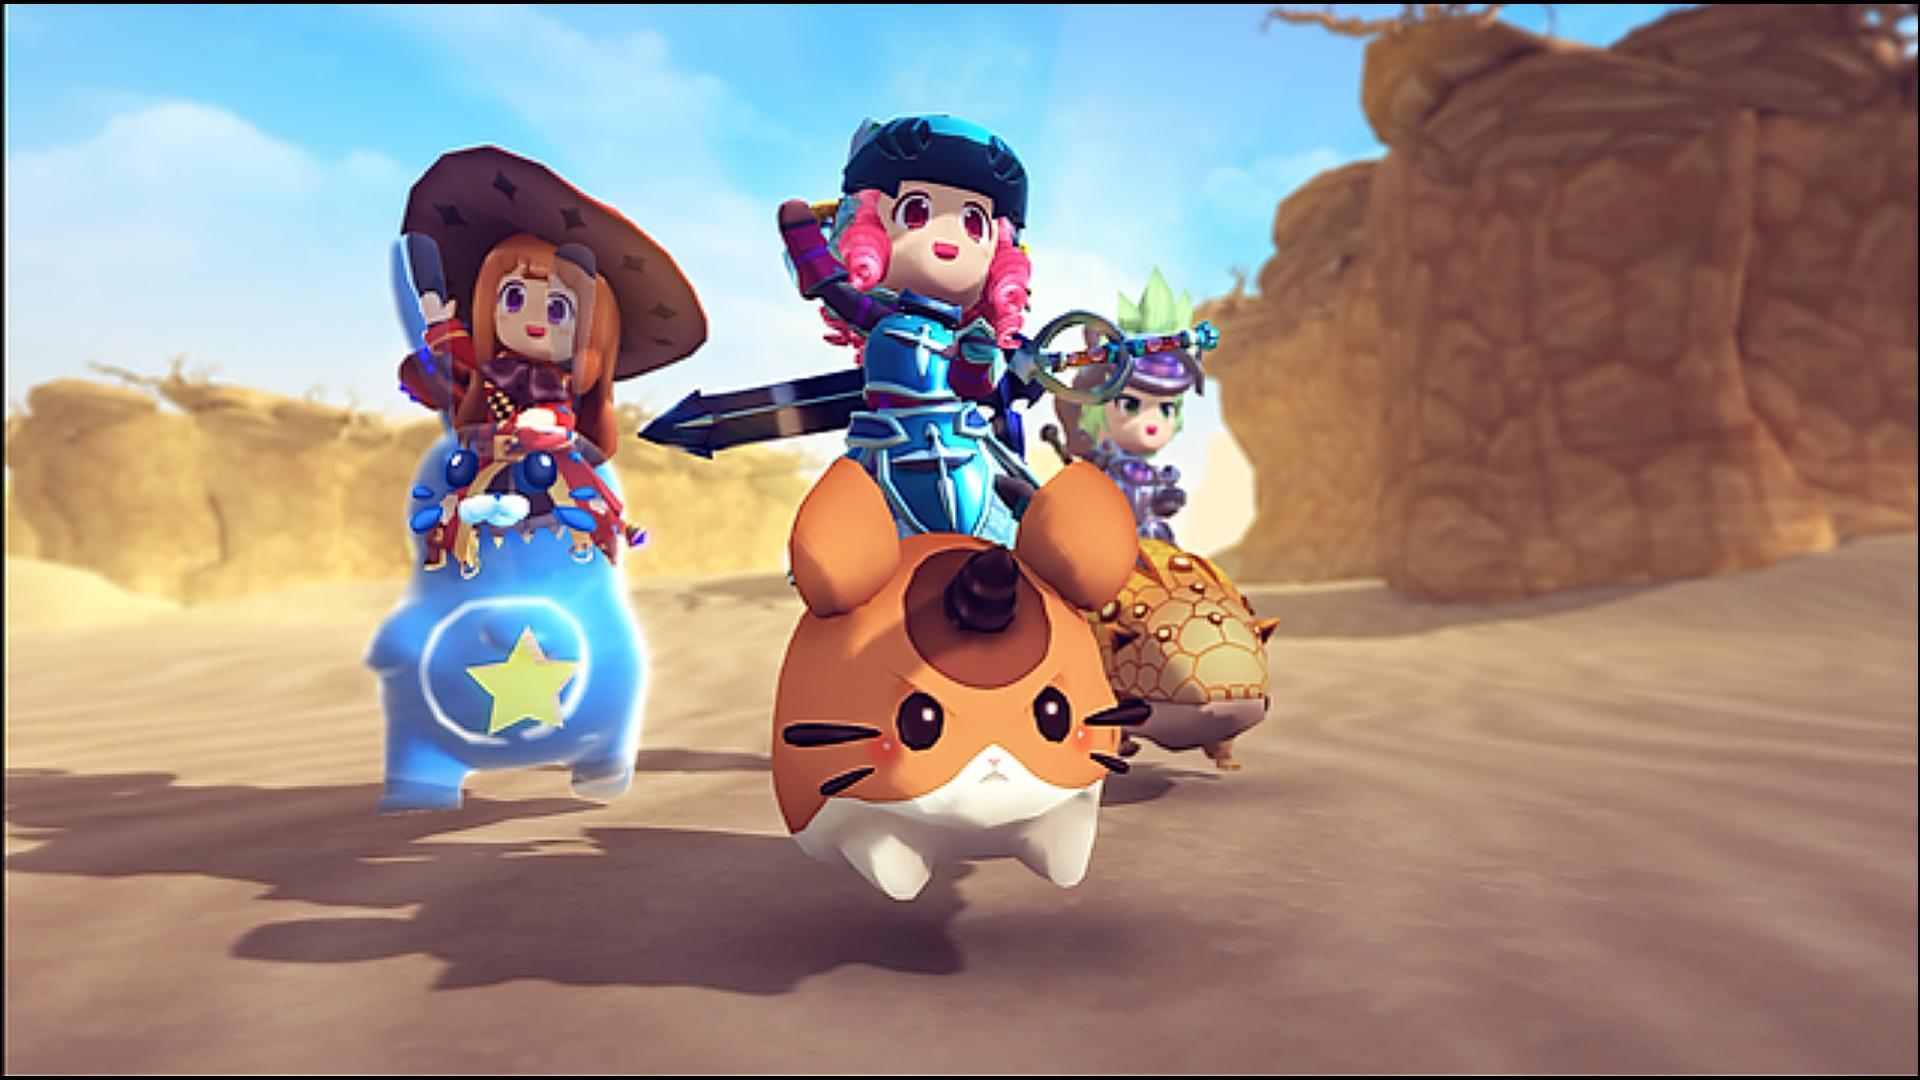 G5ZiNQI - 牧物シリーズ最新作、Switch『牧場物語 再会のミネラルタウン』が2019年10月17日に発売決定!